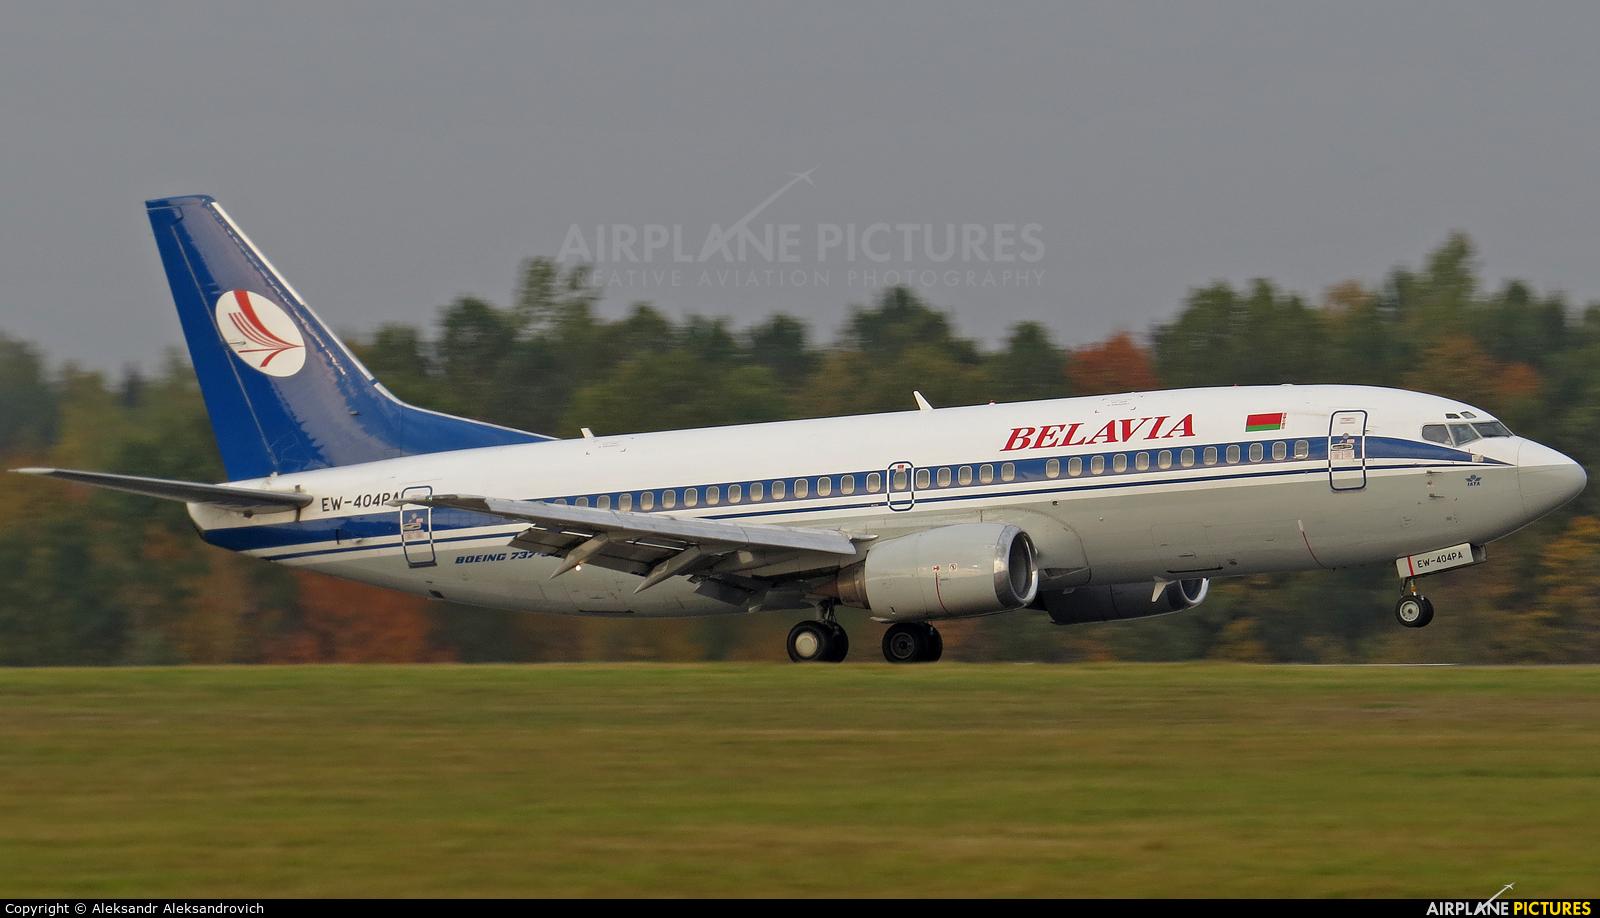 Belavia EW-404PA aircraft at Minsk Intl